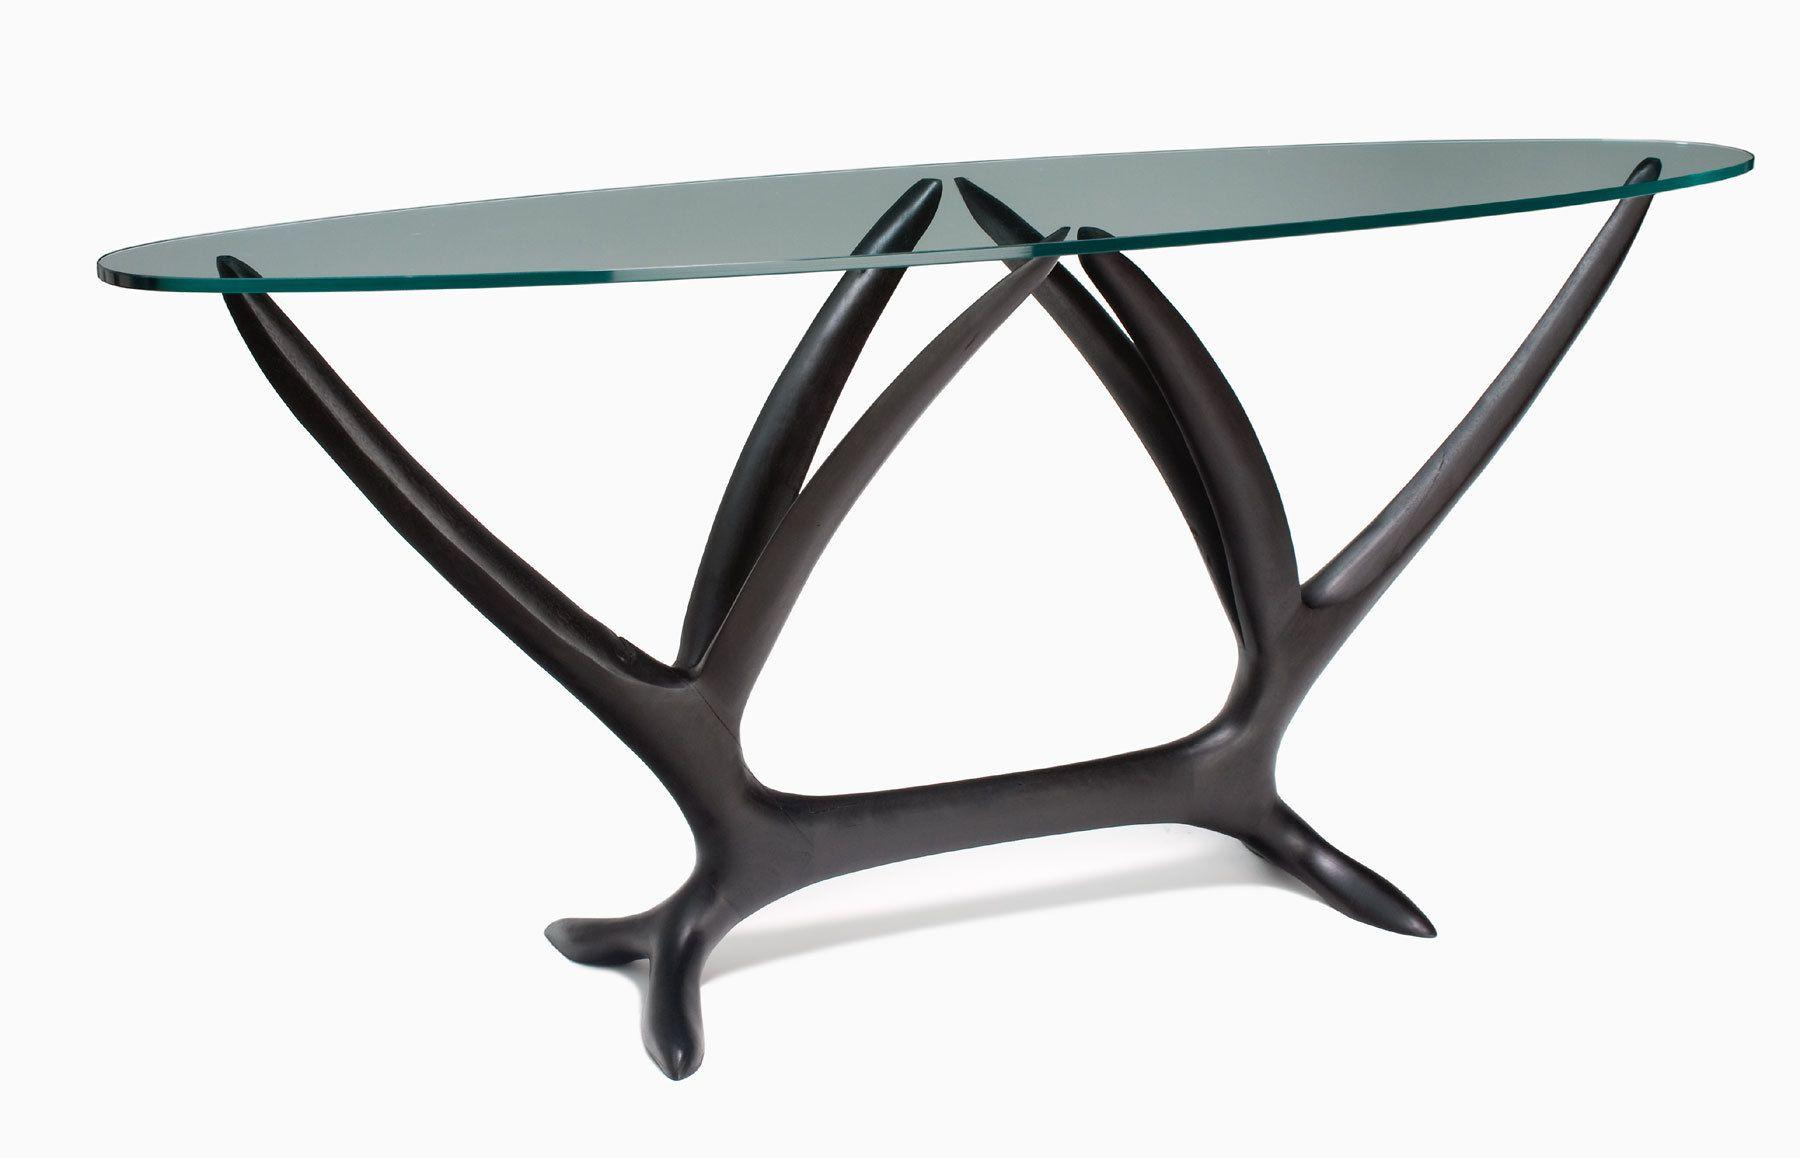 Wisteria table